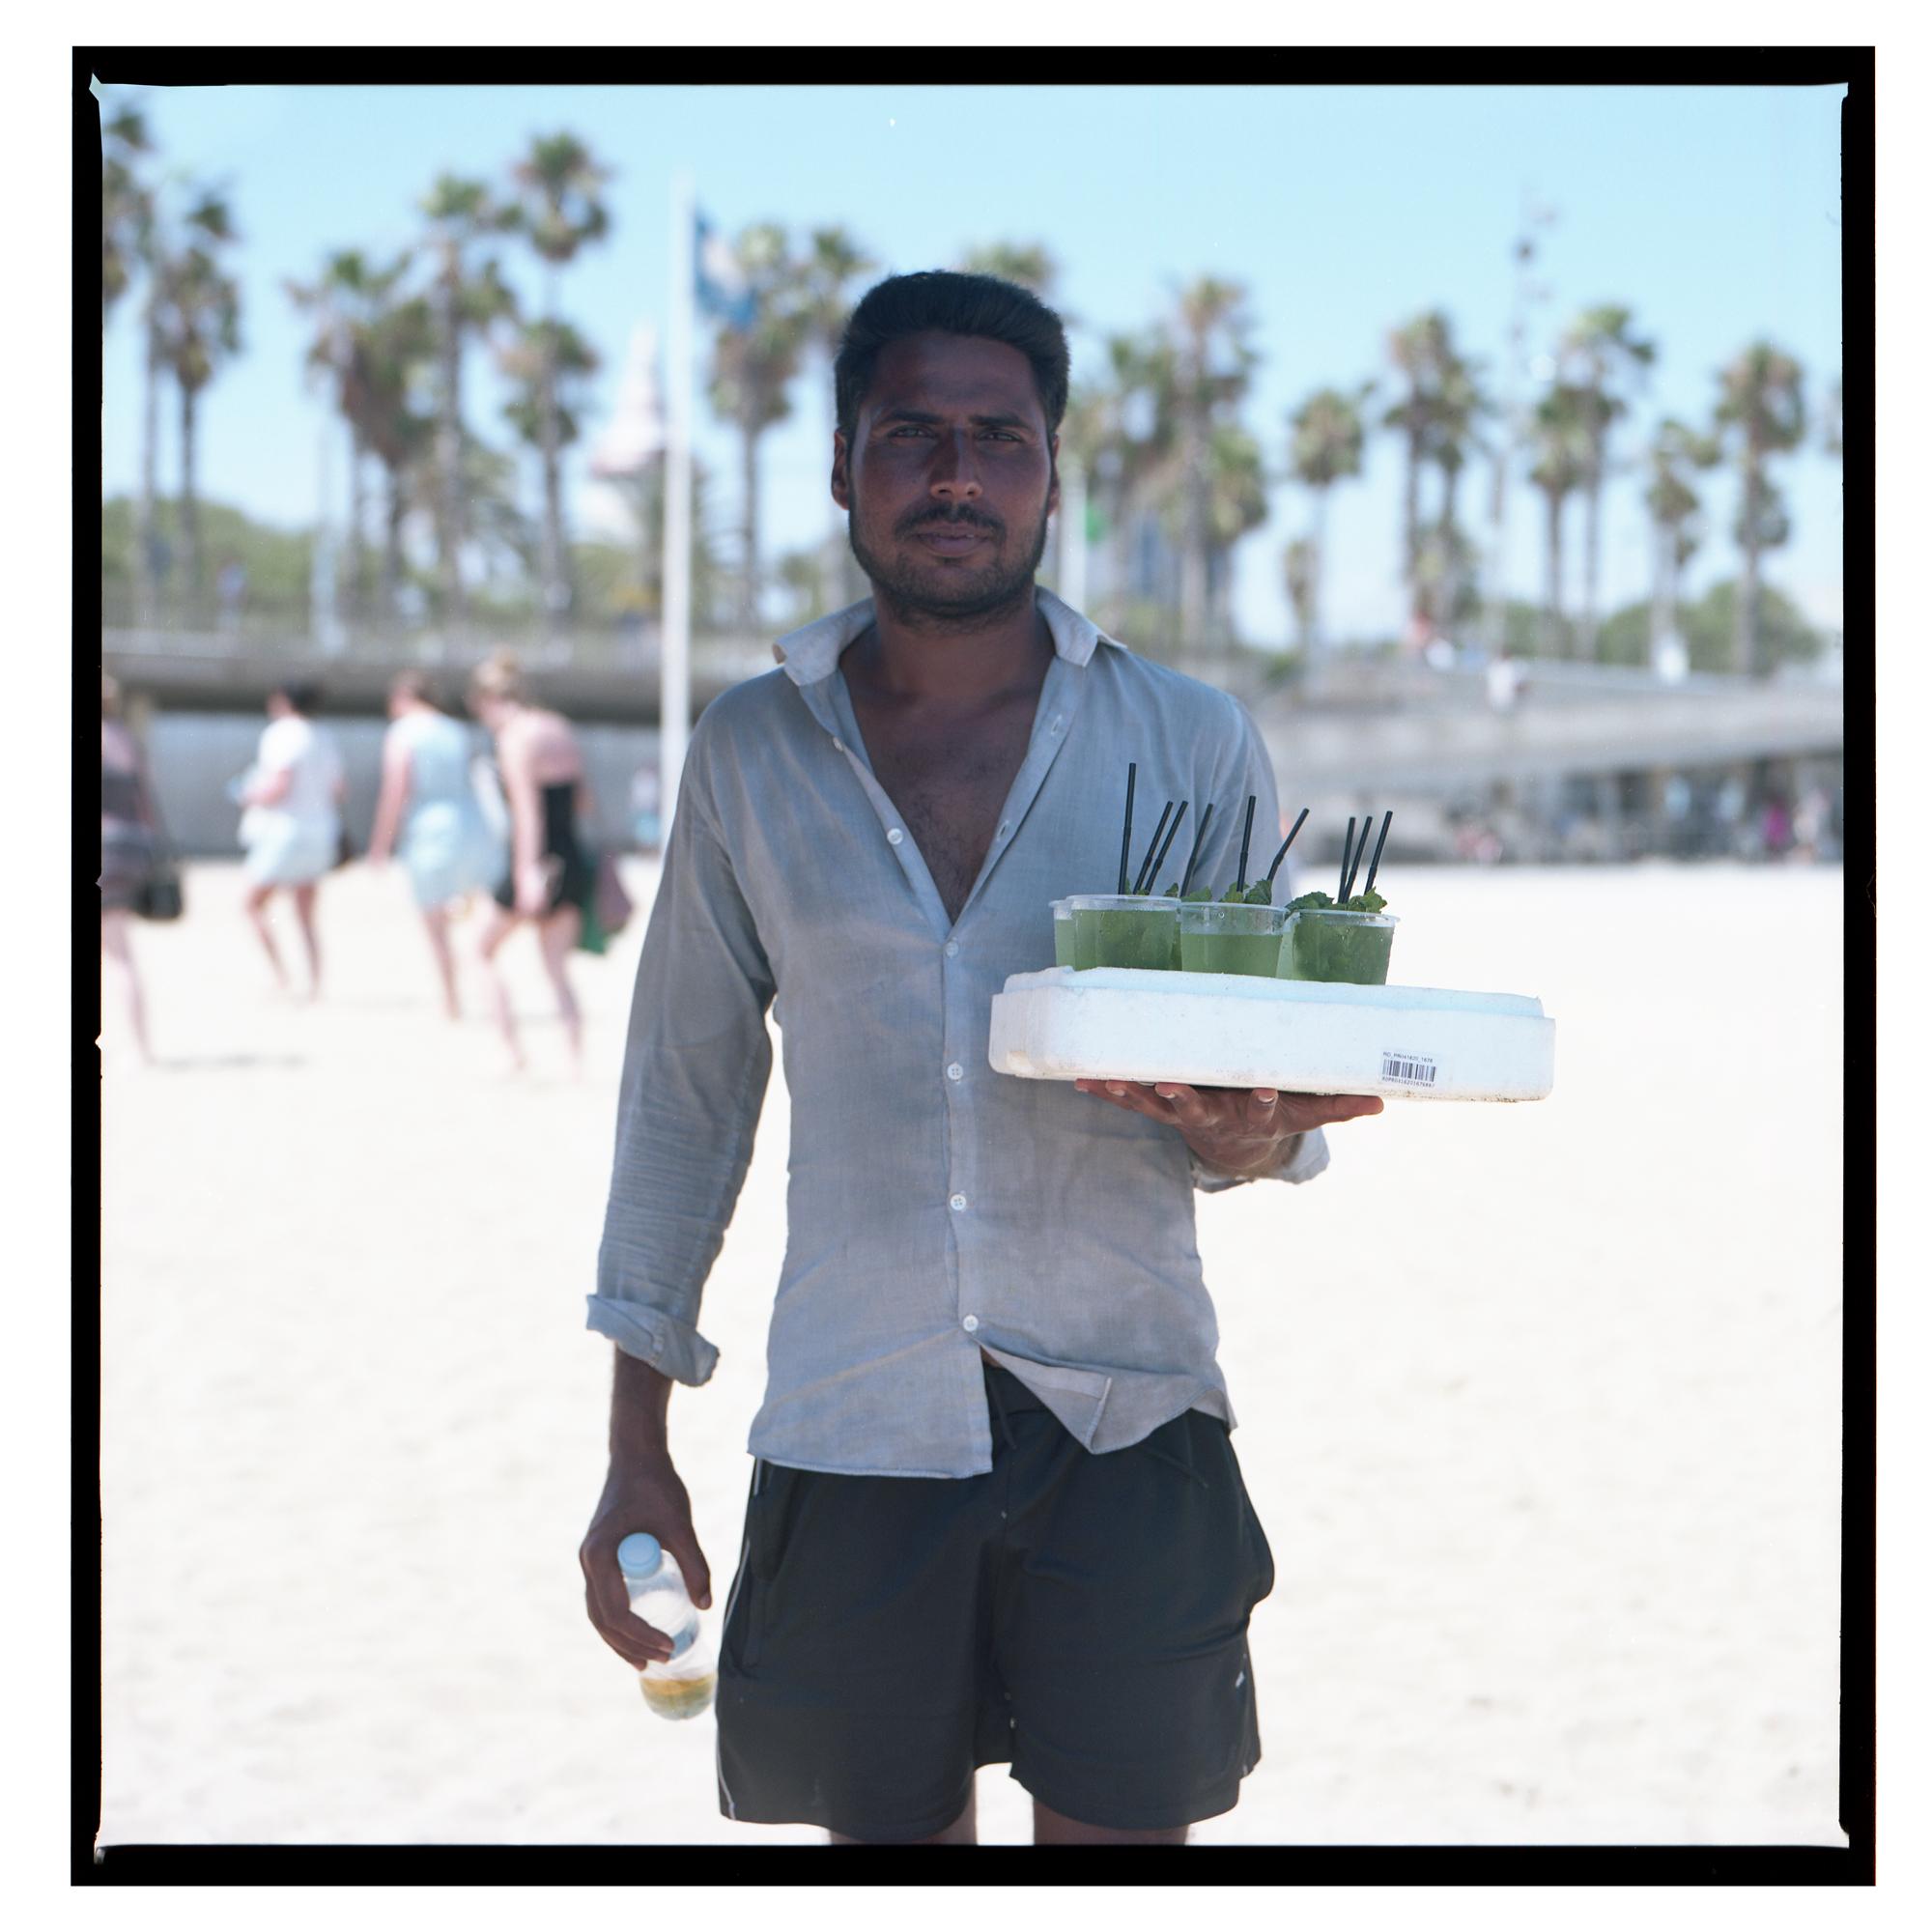 Grant Smith - Beach seller